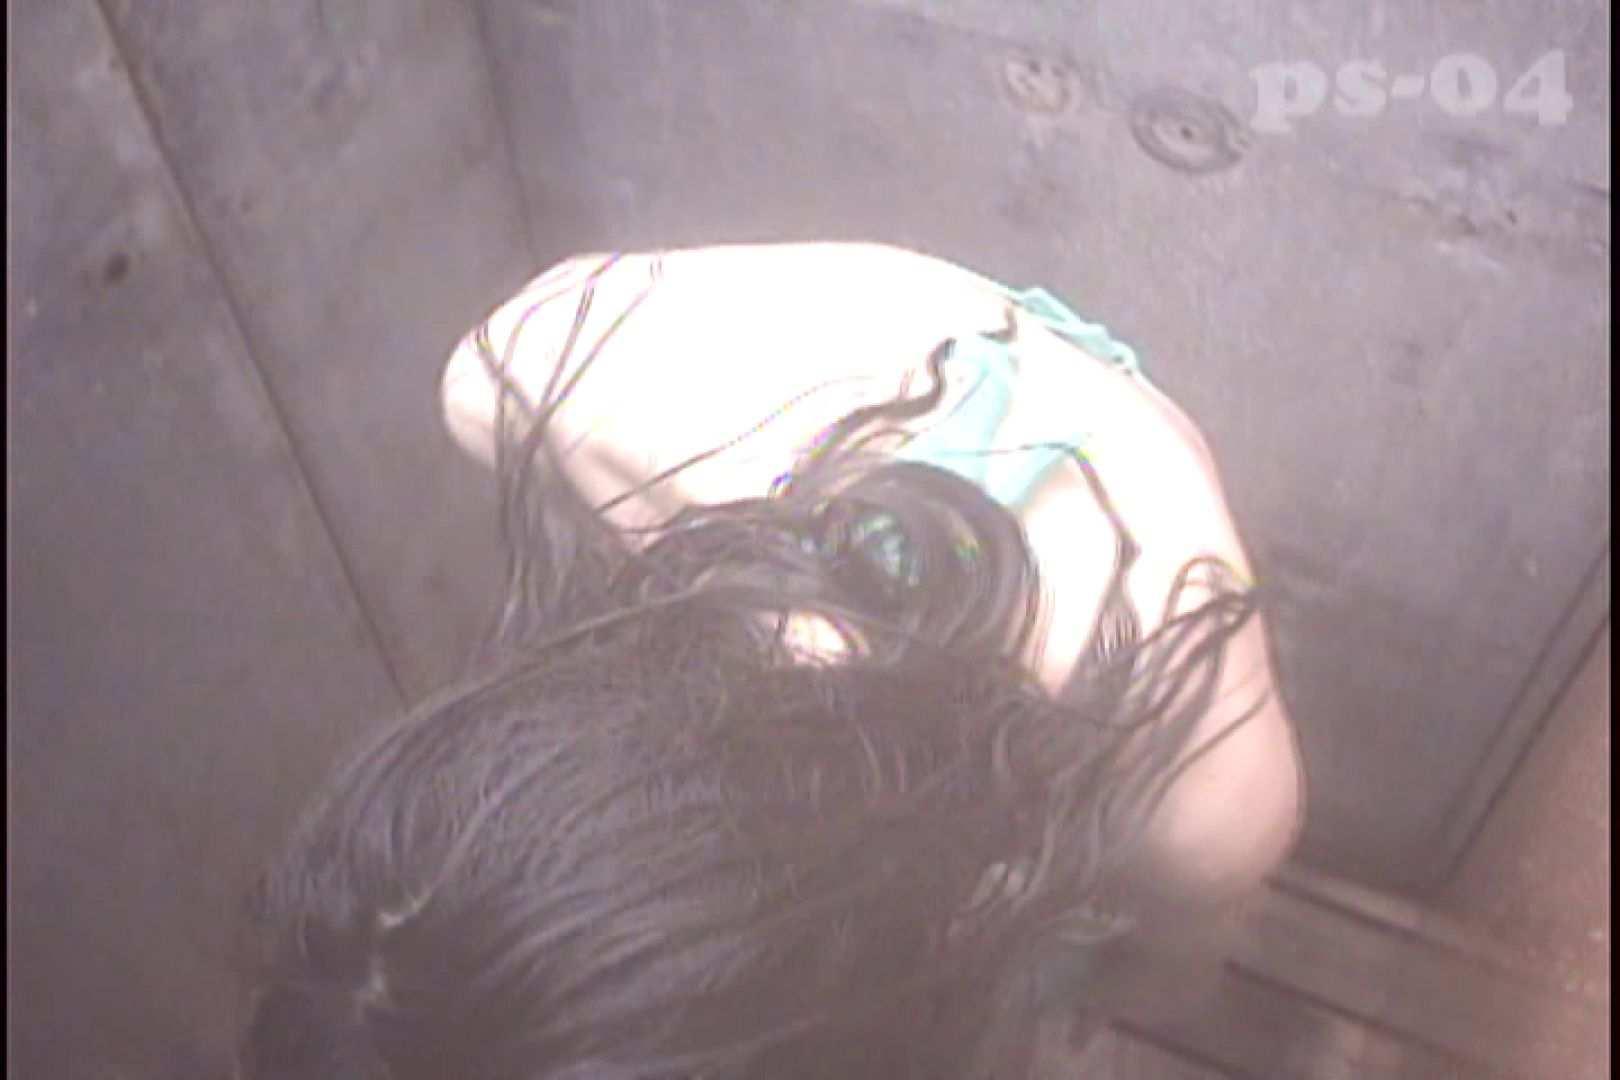 File.23 意外に巨乳、下の毛は処理済。ですが脱ぎません 名人 | シャワー中  42連発 13